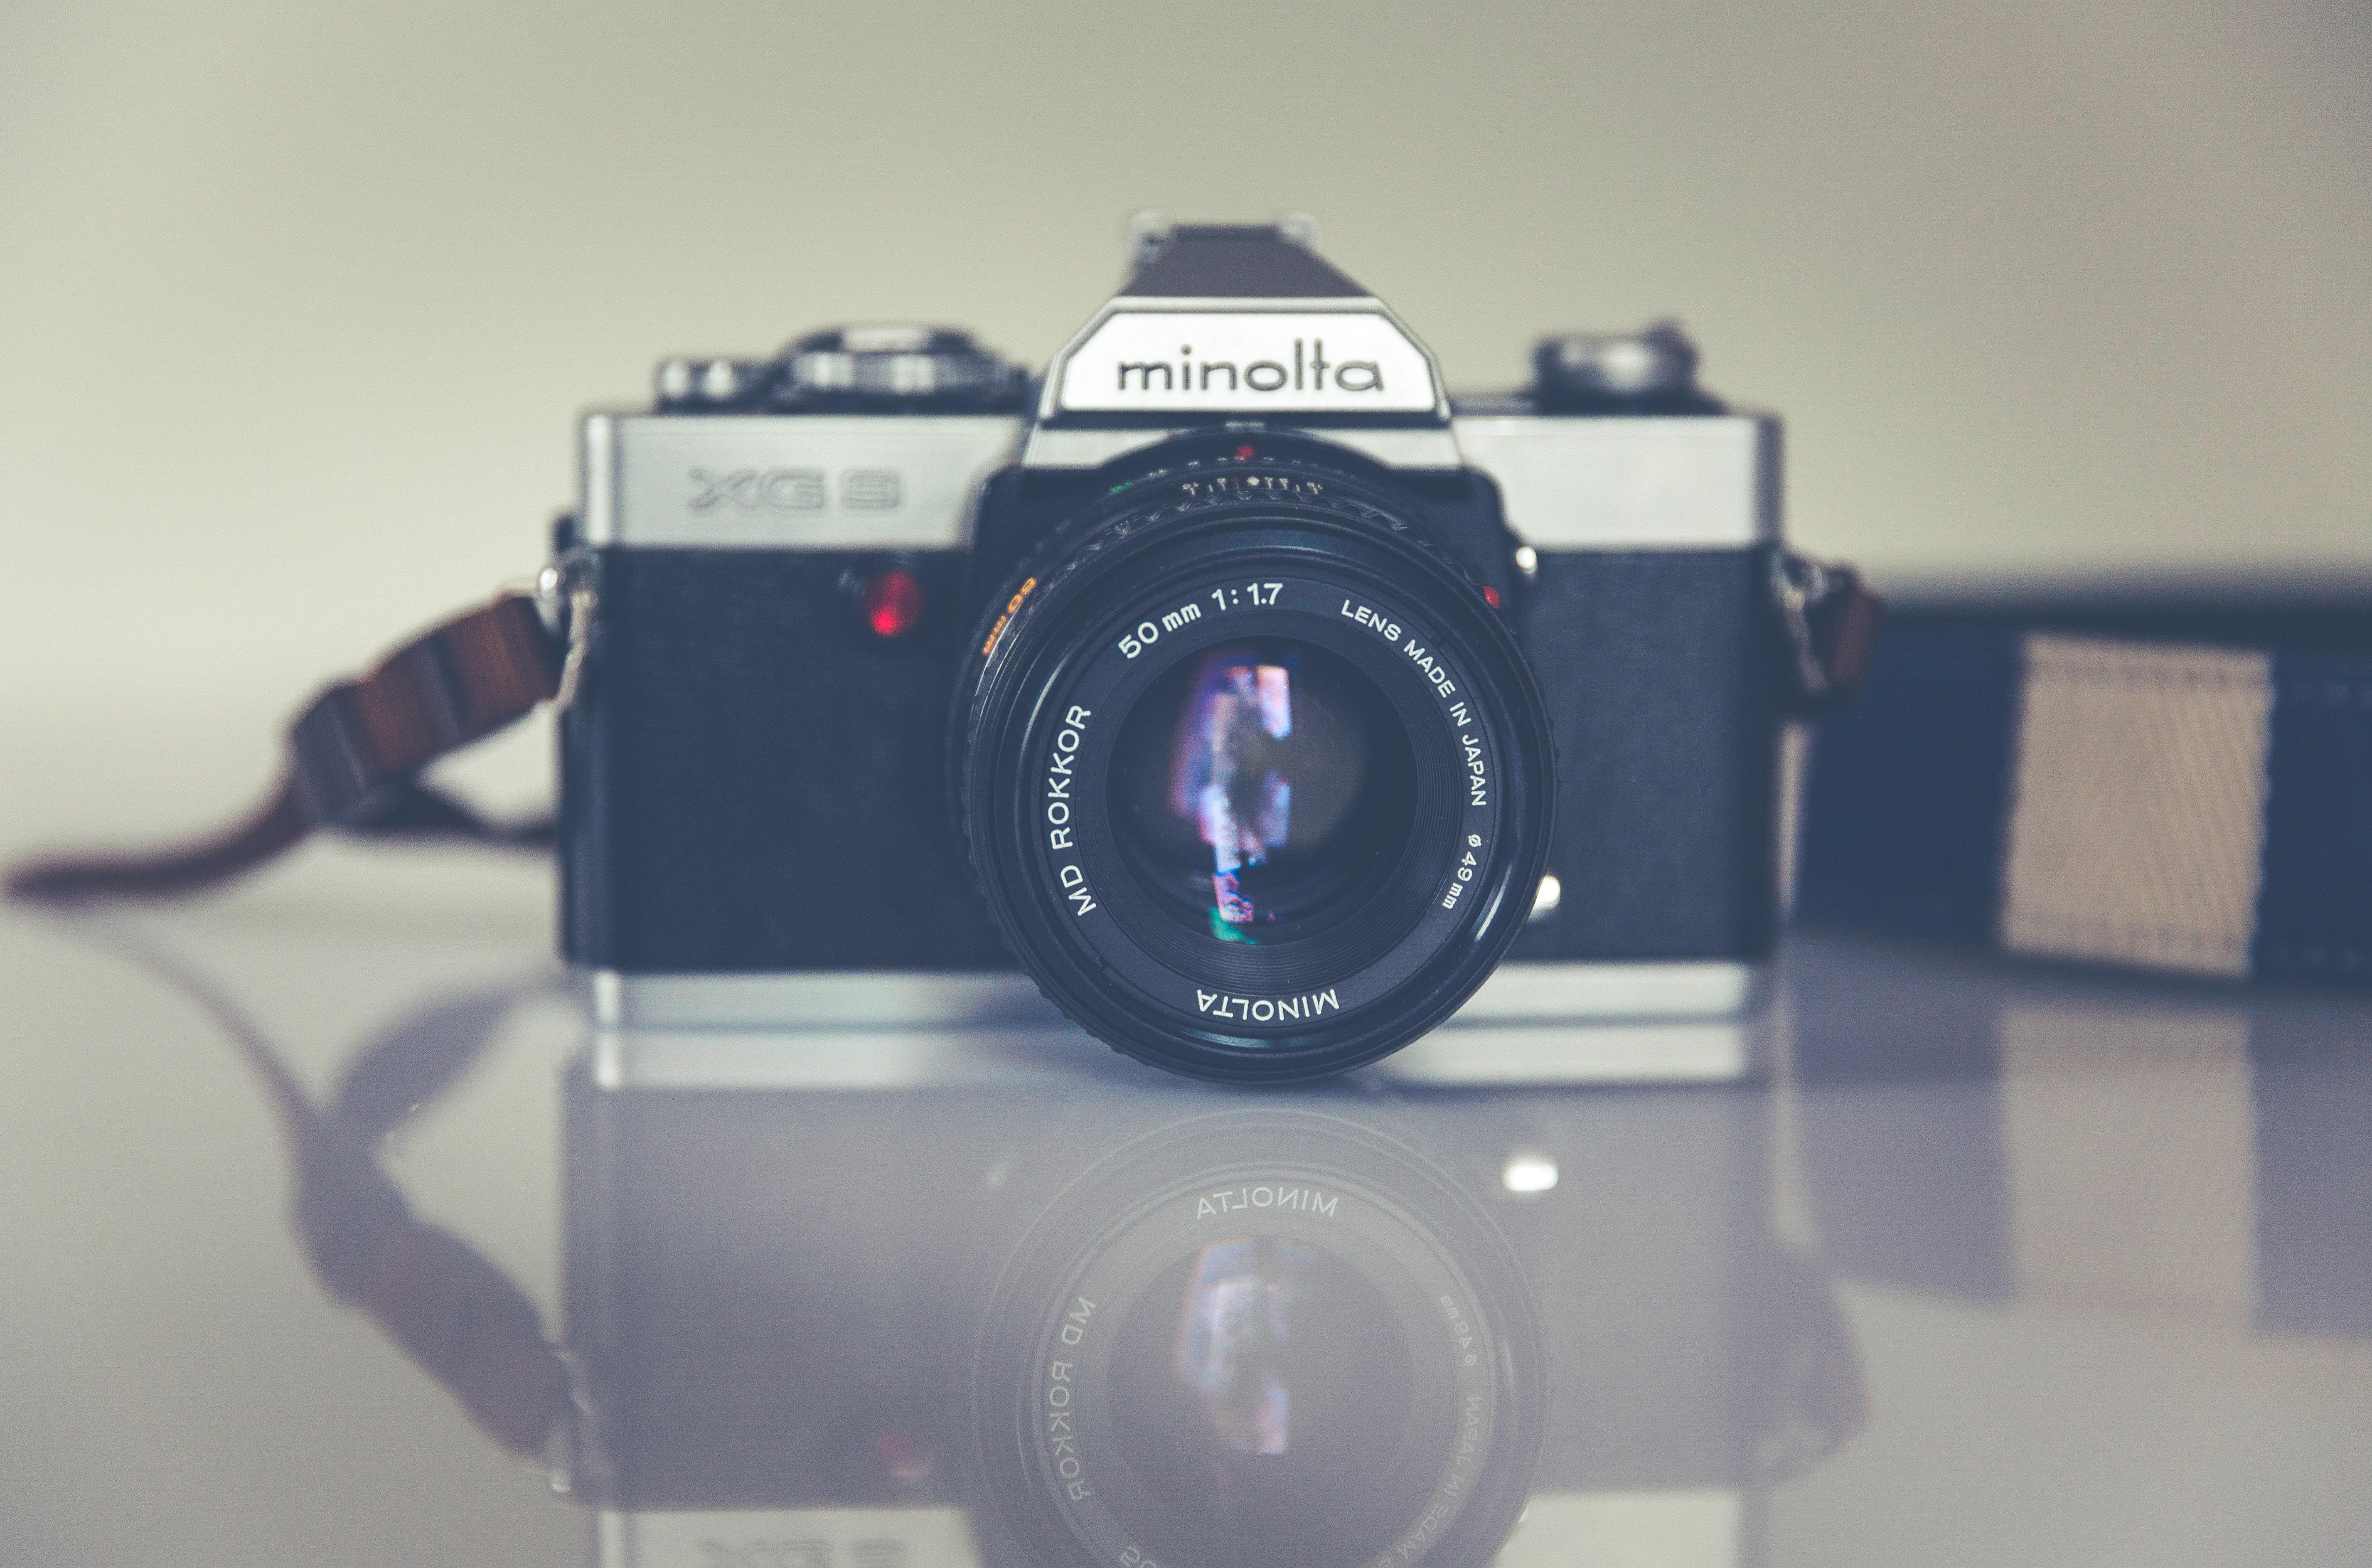 Panorama Photography of Black and Grey Minolta Camera, Analog, Optical, Vintage, Technology, HQ Photo